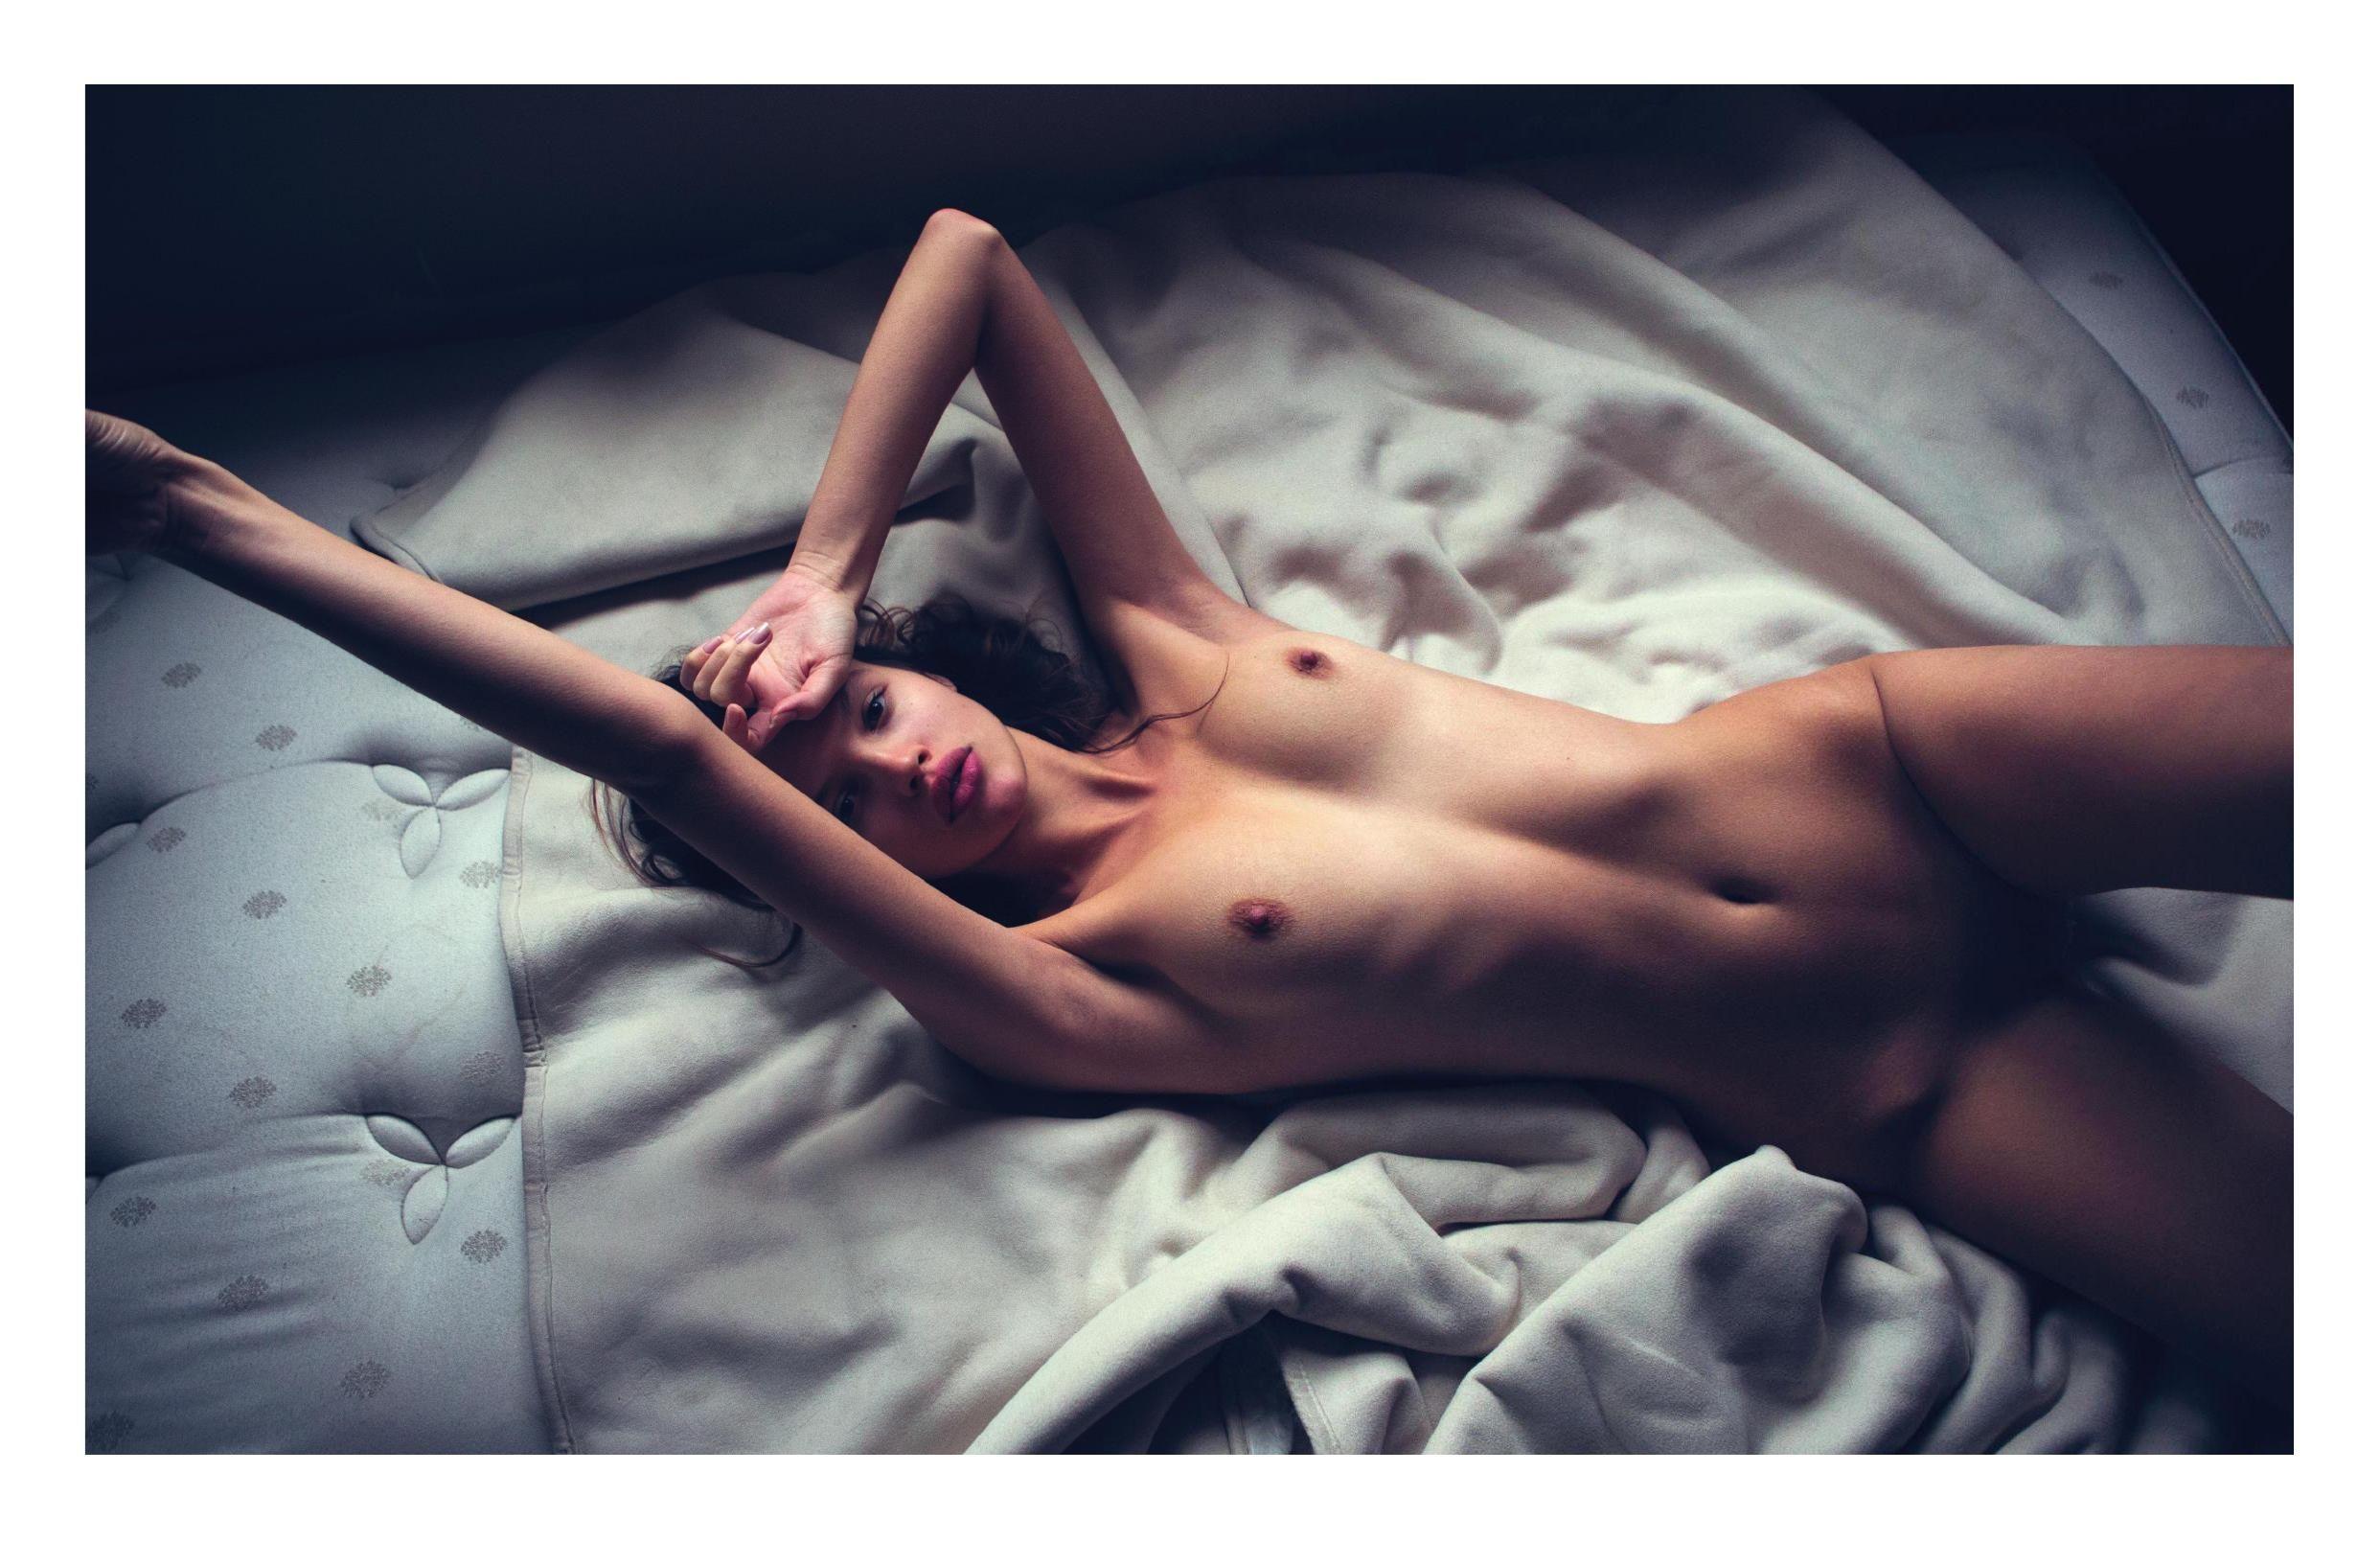 Cleavage Bianca Mihoc nude photos 2019